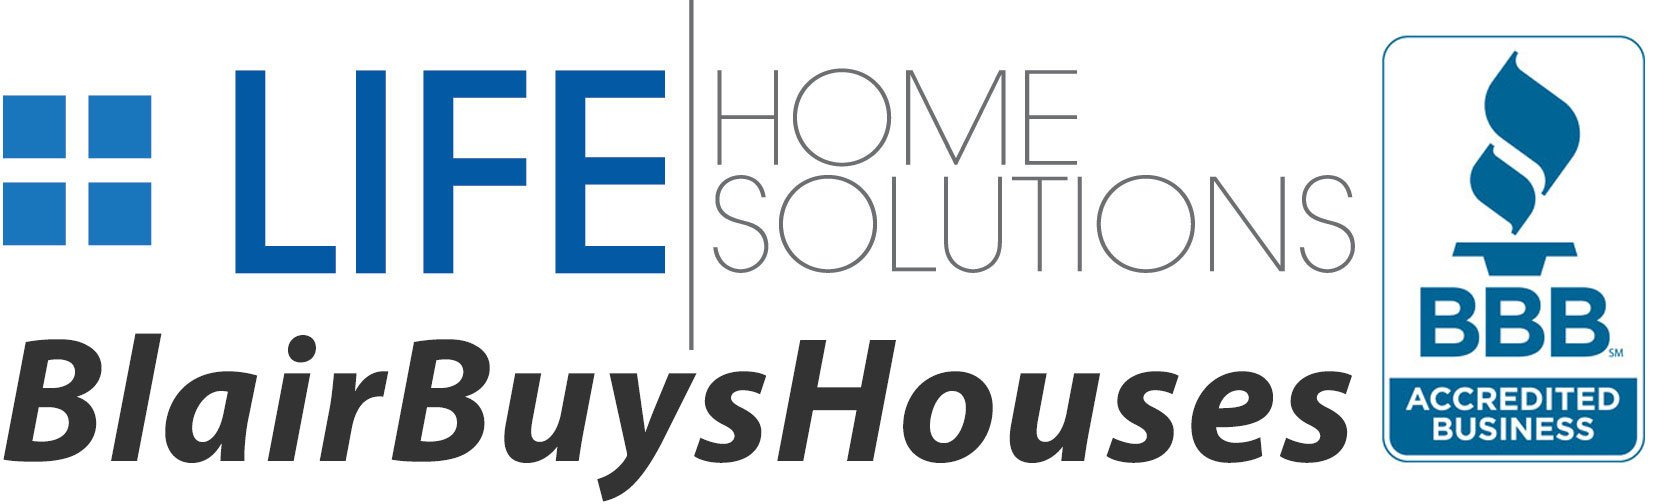 Life Home Solutions logo